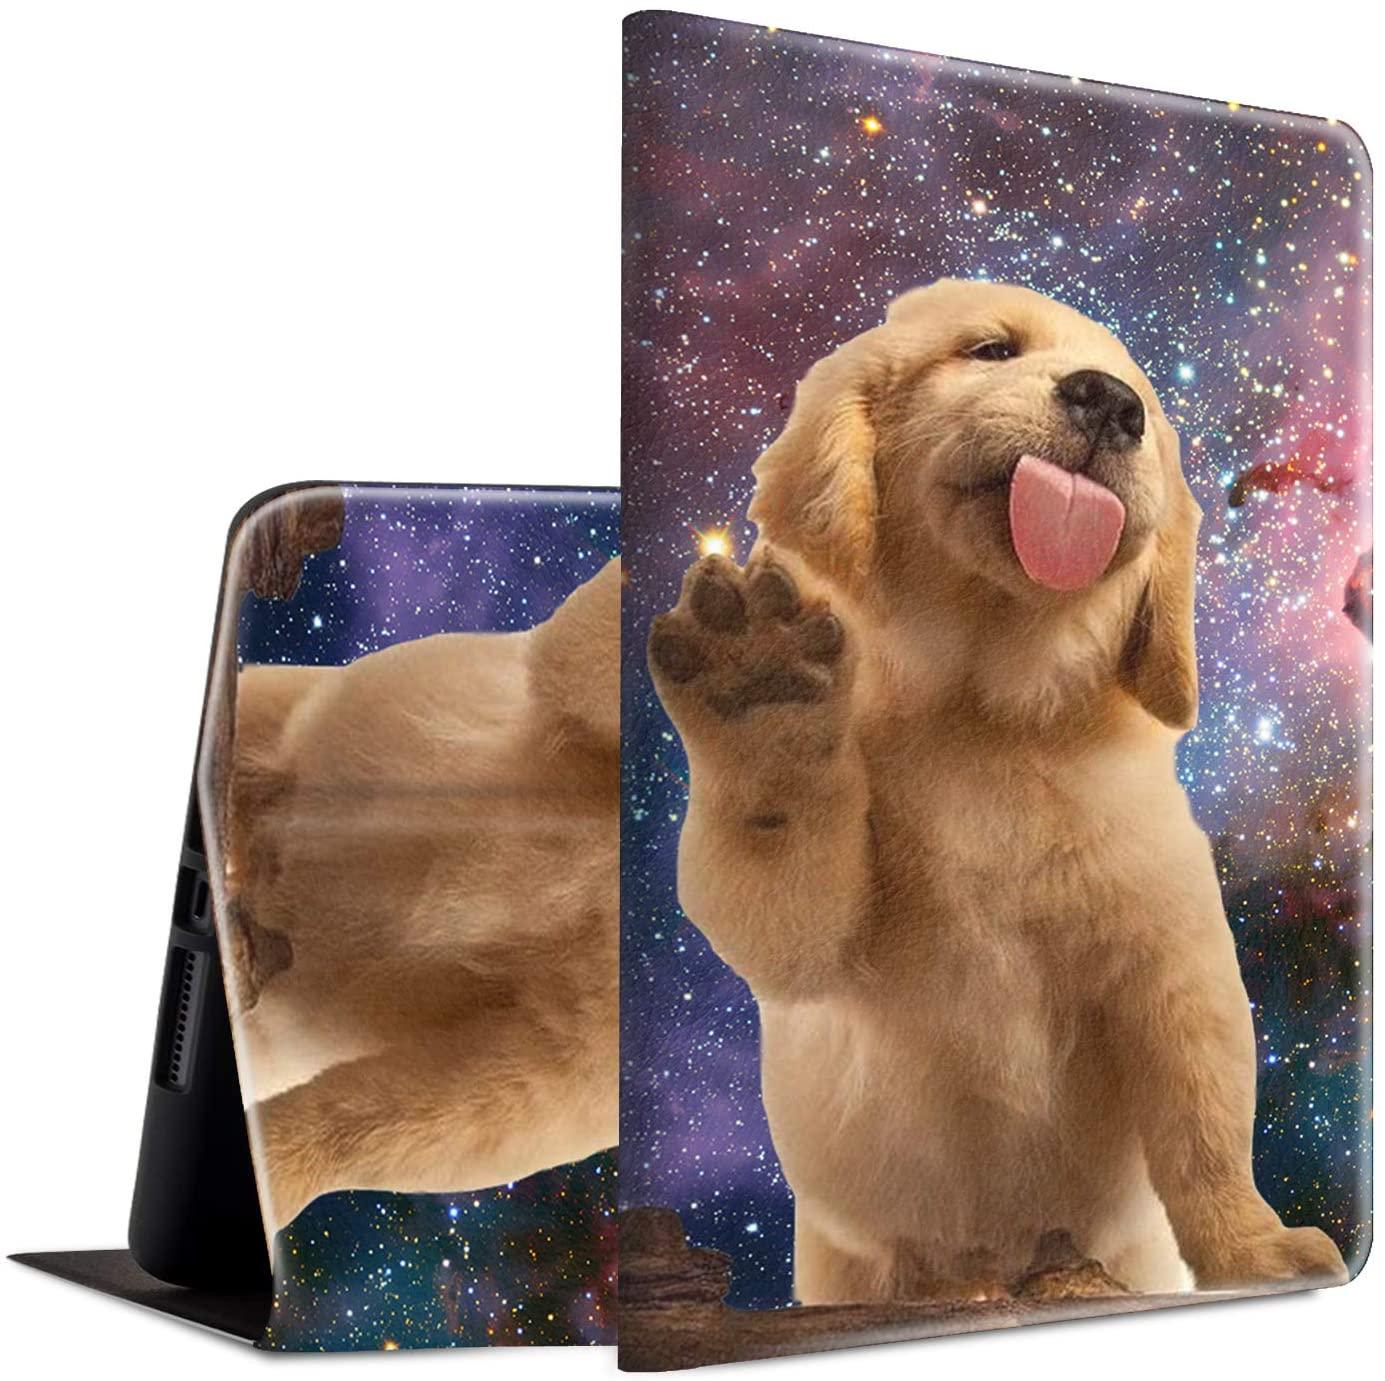 iPad Pro 10.5 / iPad Air 3 2019 Case, Spsun Lightweight PU Leather Folio Adjustable Stand with Auto Wake/Sleep Smart Protect Case for Apple iPad Air 3/ iPad Pro 10.5 - Golden Retriever Puppy Dog